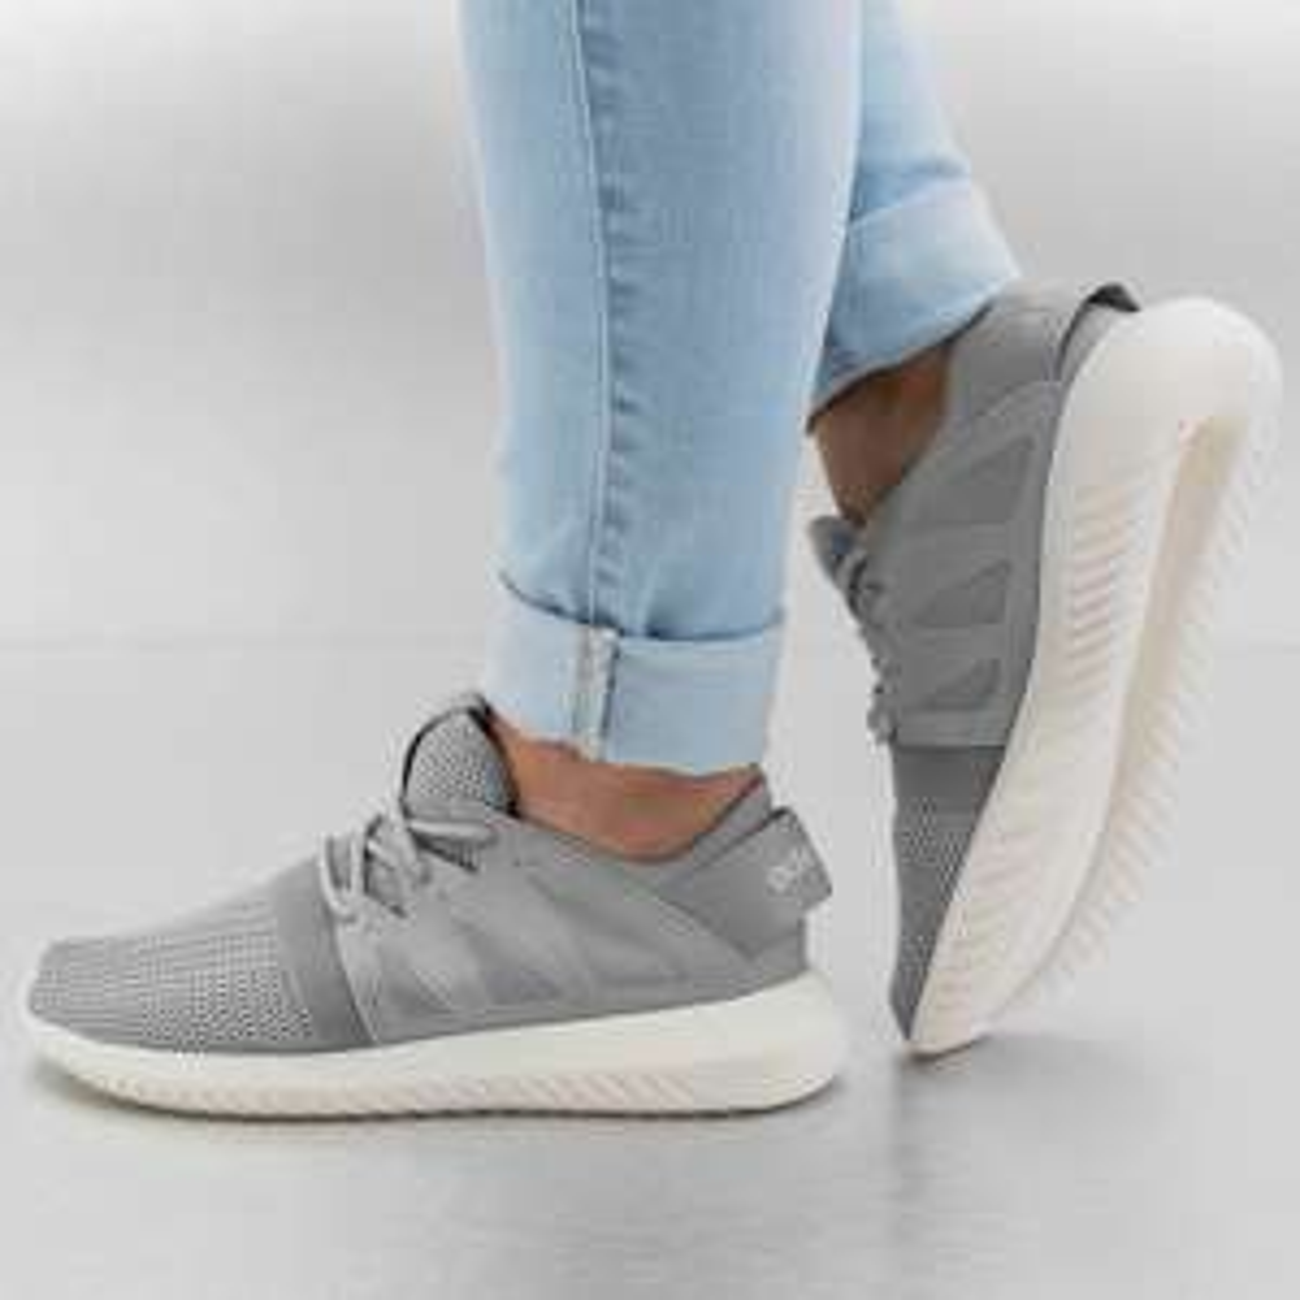 [Damen Sneaker] ADIDAS Tubular Viral (grau) 38 - 41 2/3 statt 109,99 € @Defshop